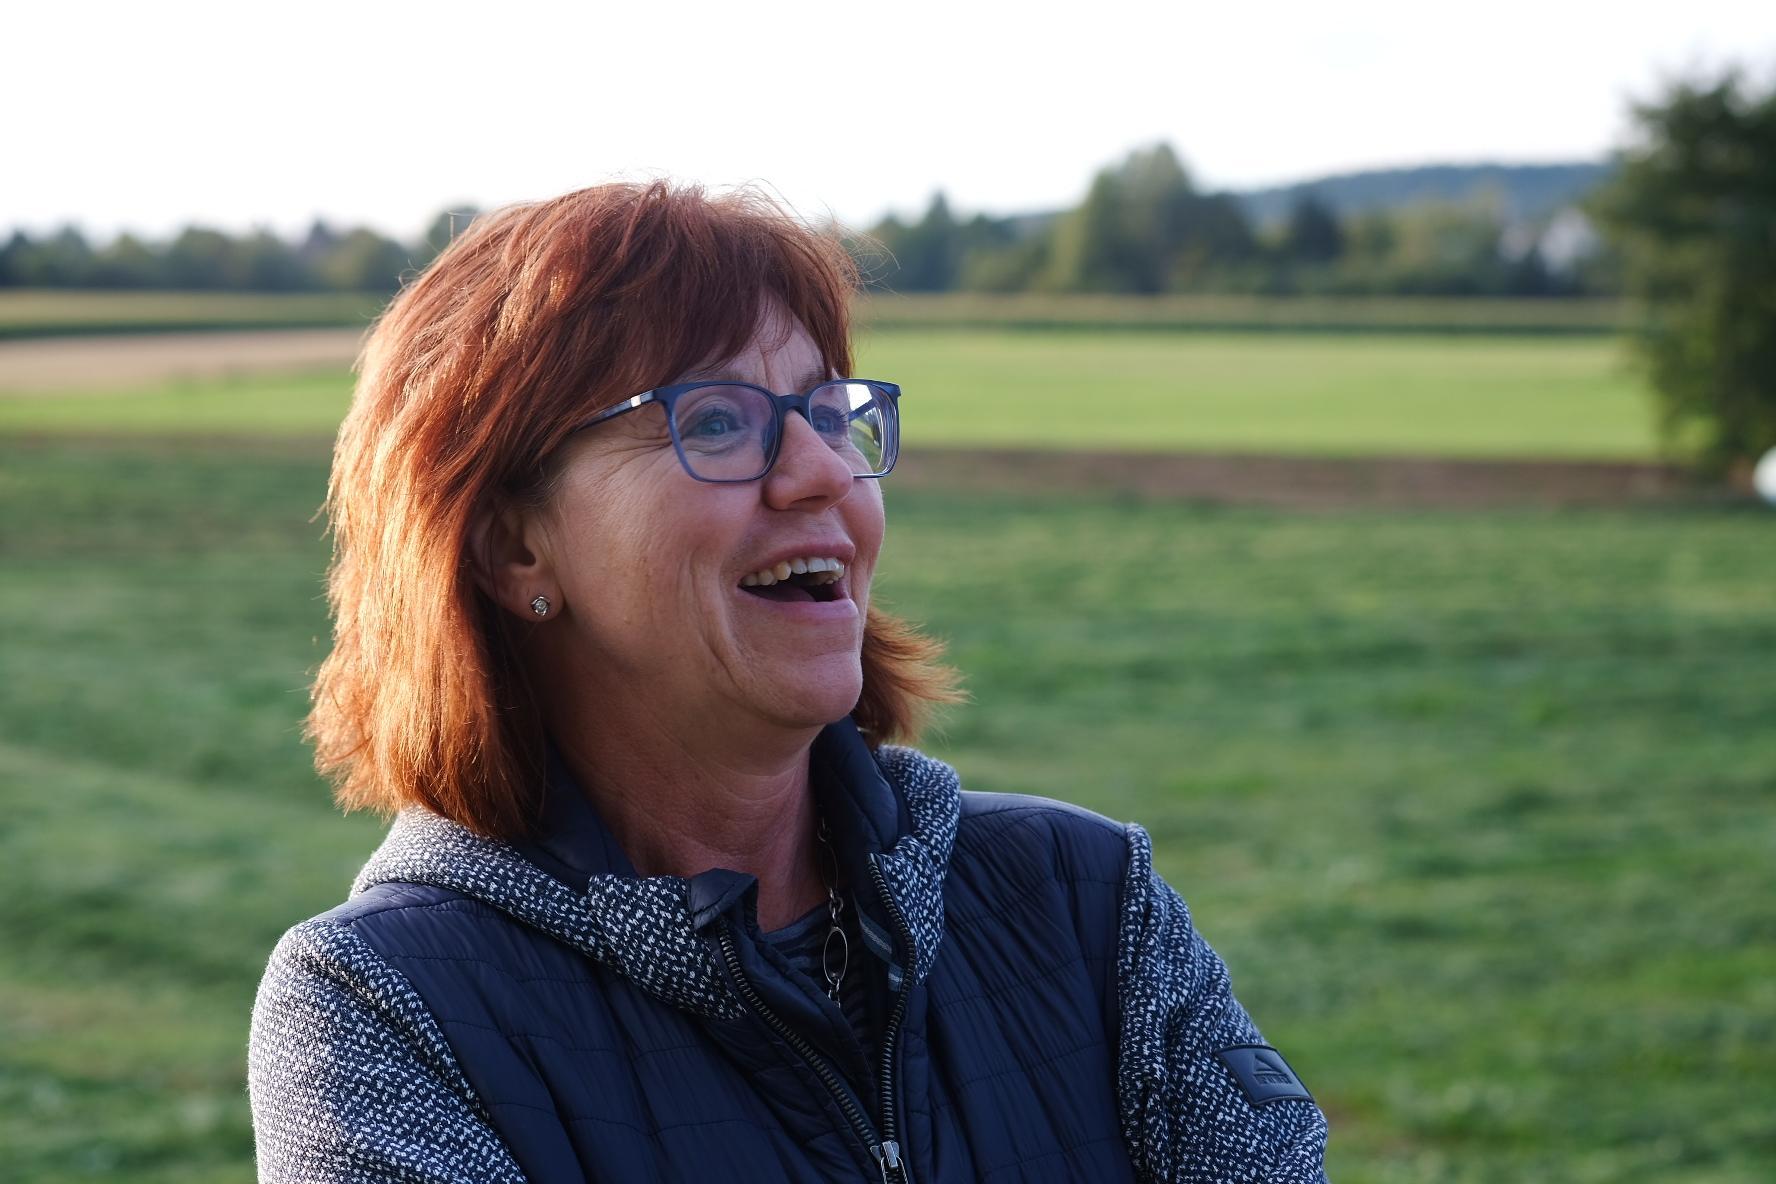 Lachende Frau in der Natur